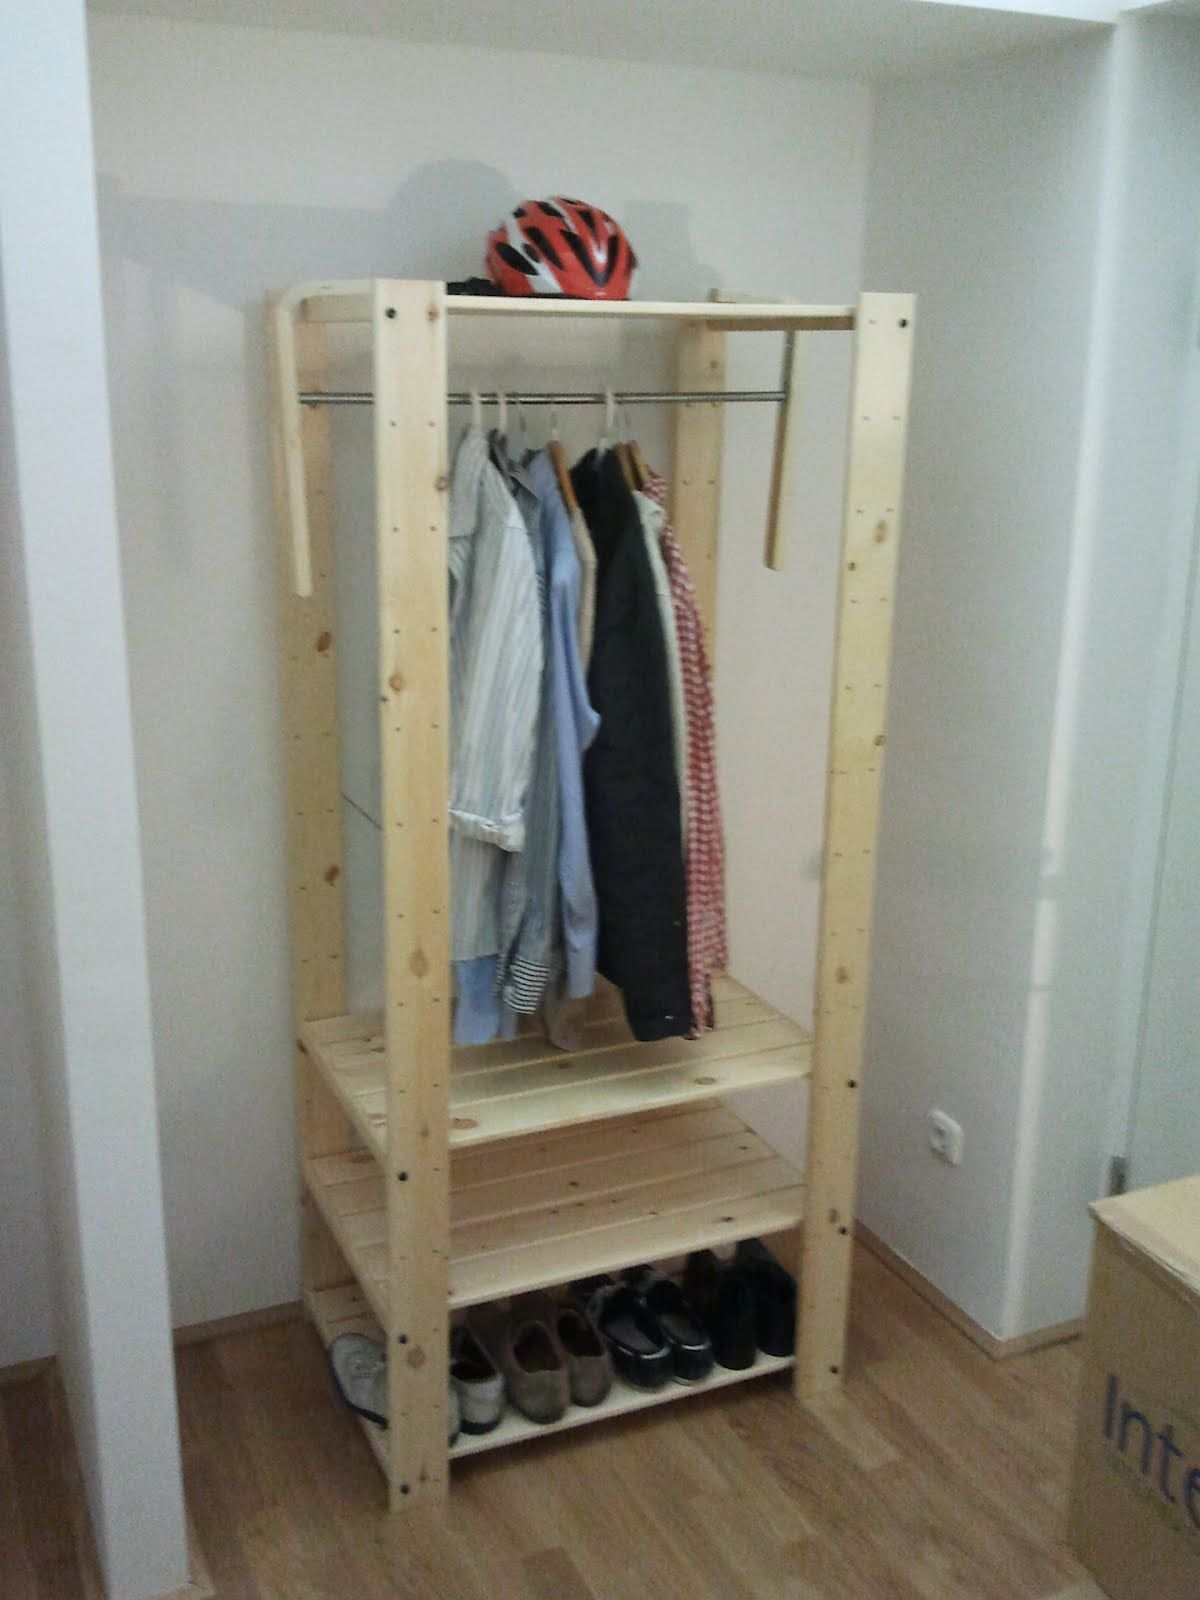 Stellingkast Gorm Van Ikea.The 40 Euro Wardrobe Organizing Ikea Wardrobe Wardrobe Storage